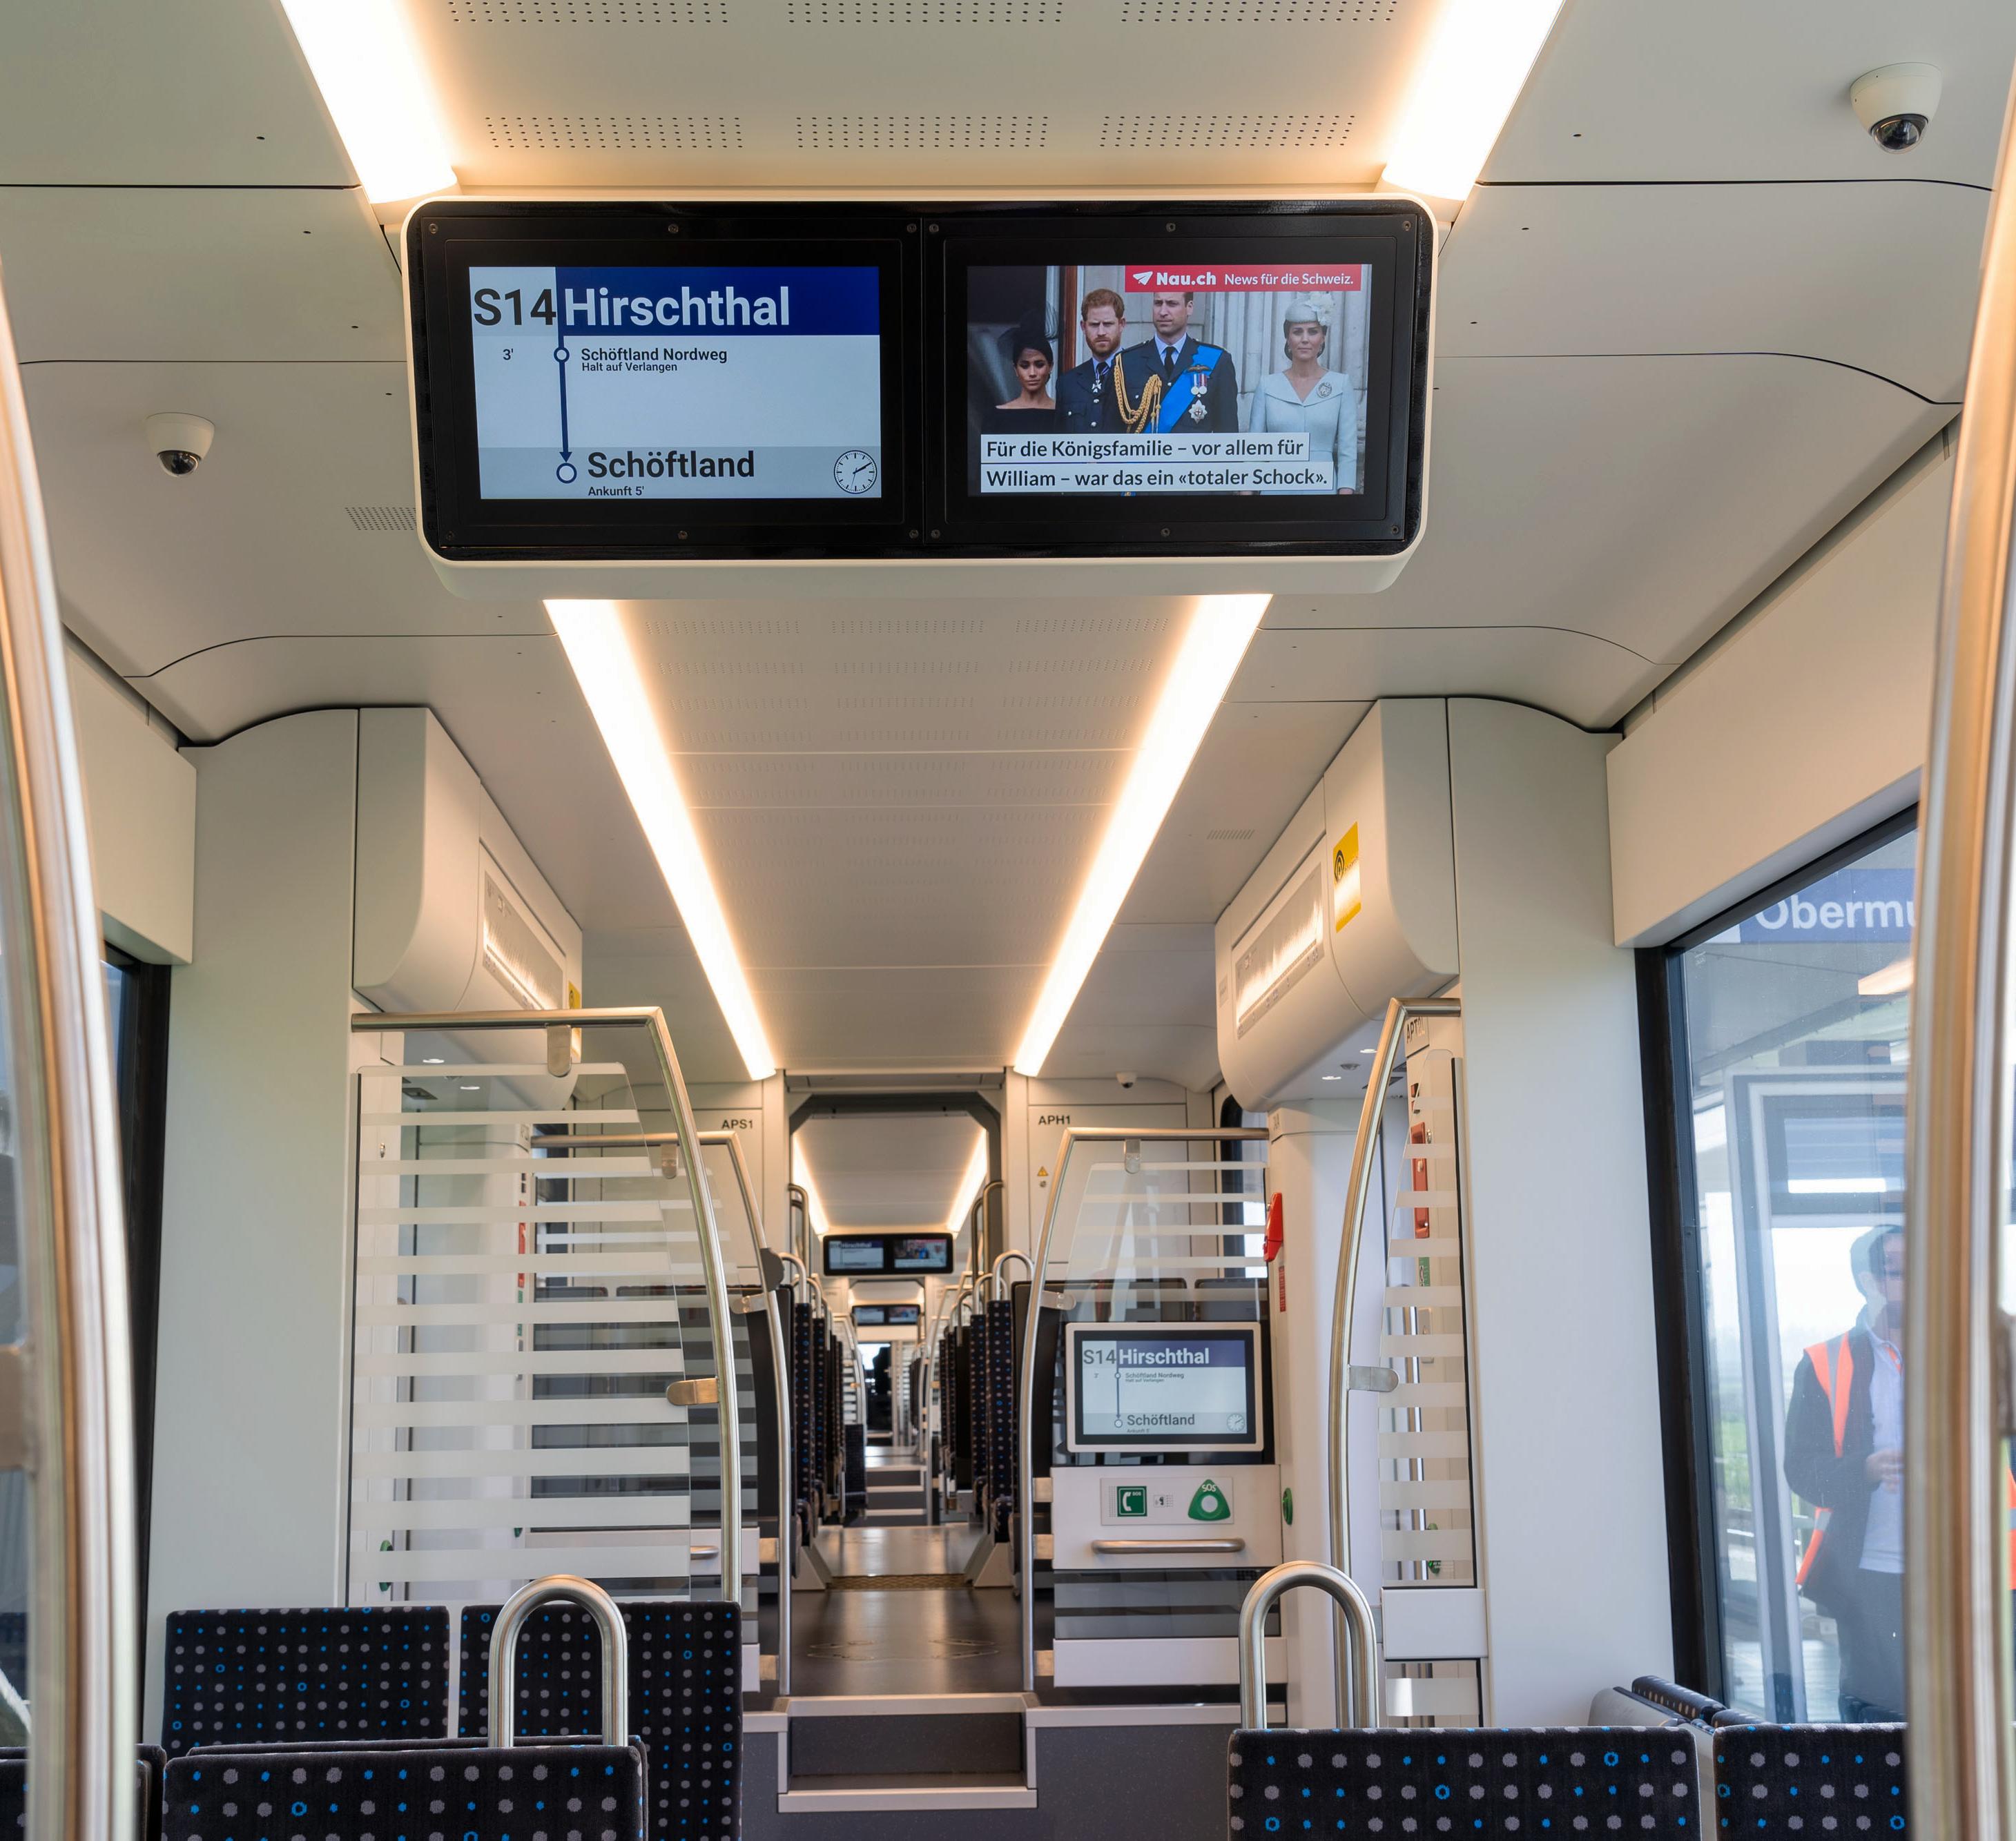 Fahrgastinformation im Zug